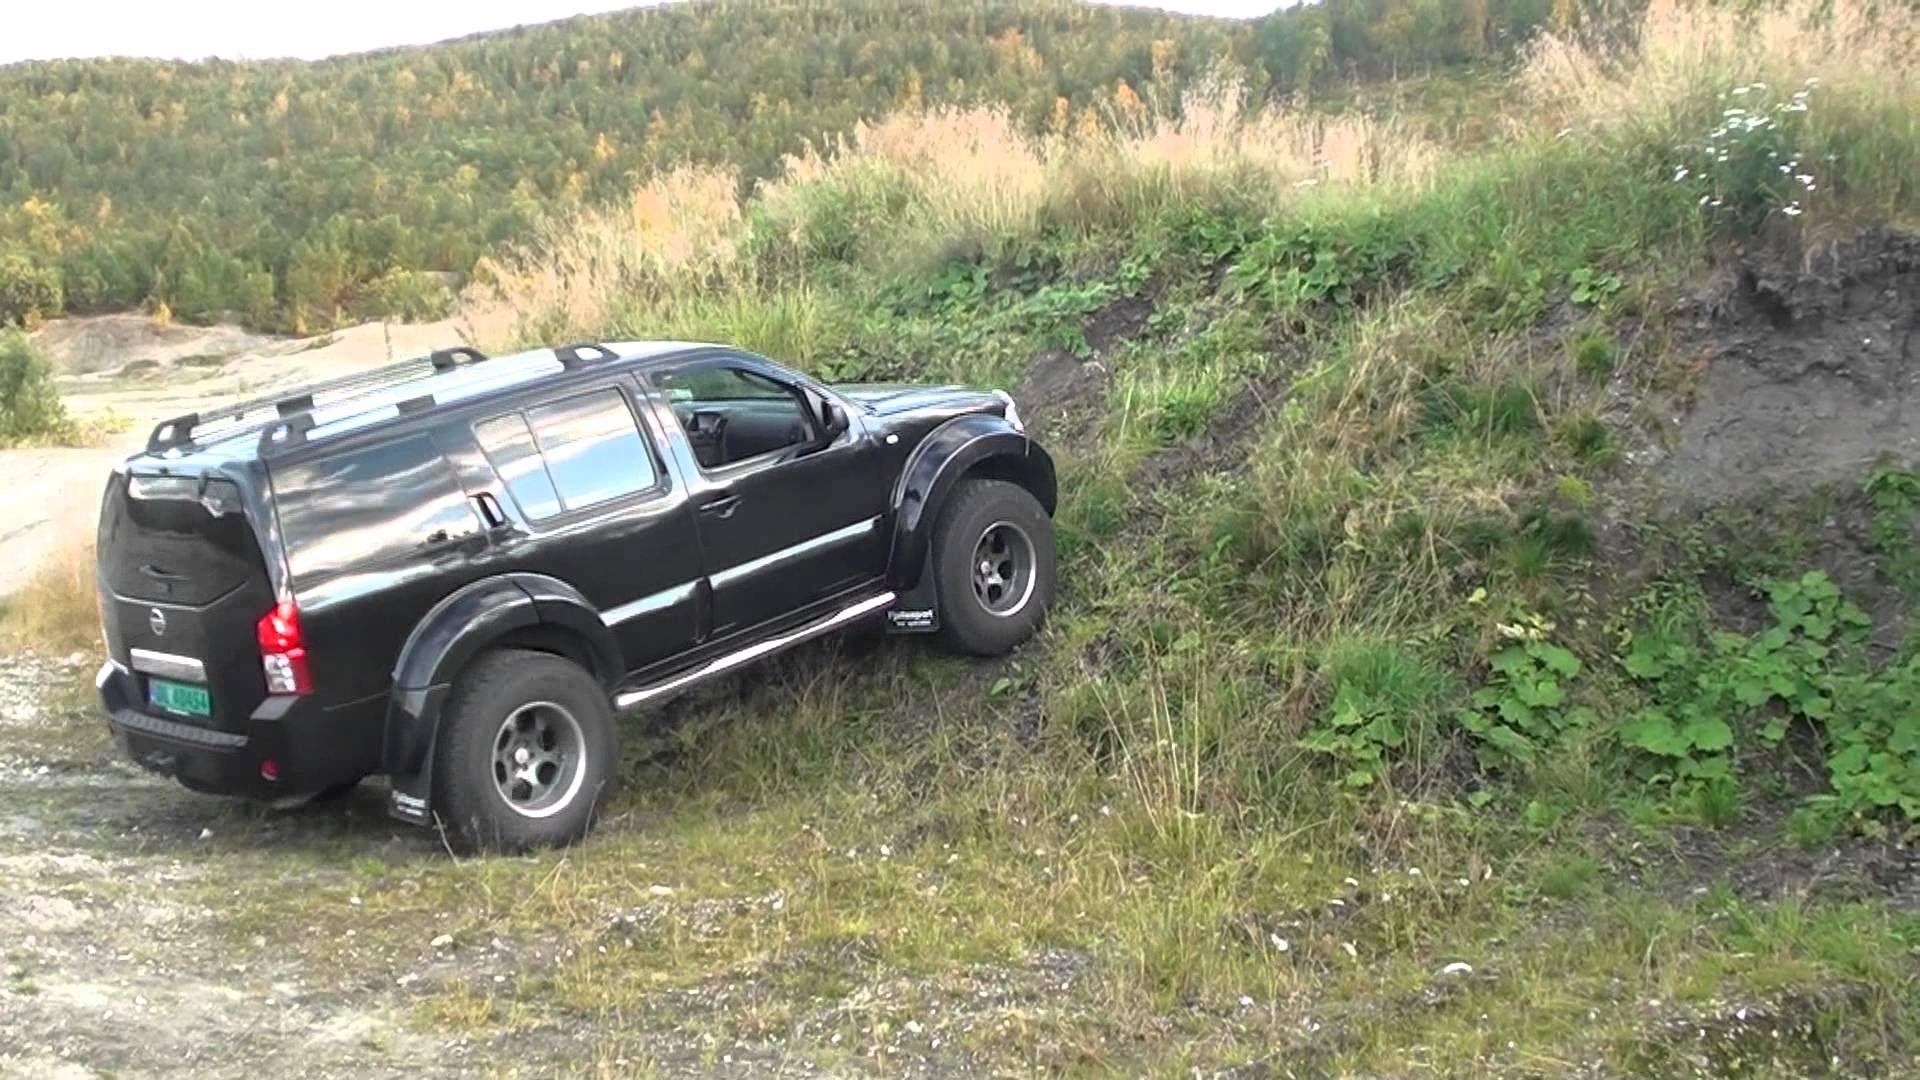 Nissan pathfinder fjallasport xtreme4x4 part 1 pathfinder nissan pathfinder fjallasport xtreme4x4 part 1 vanachro Images